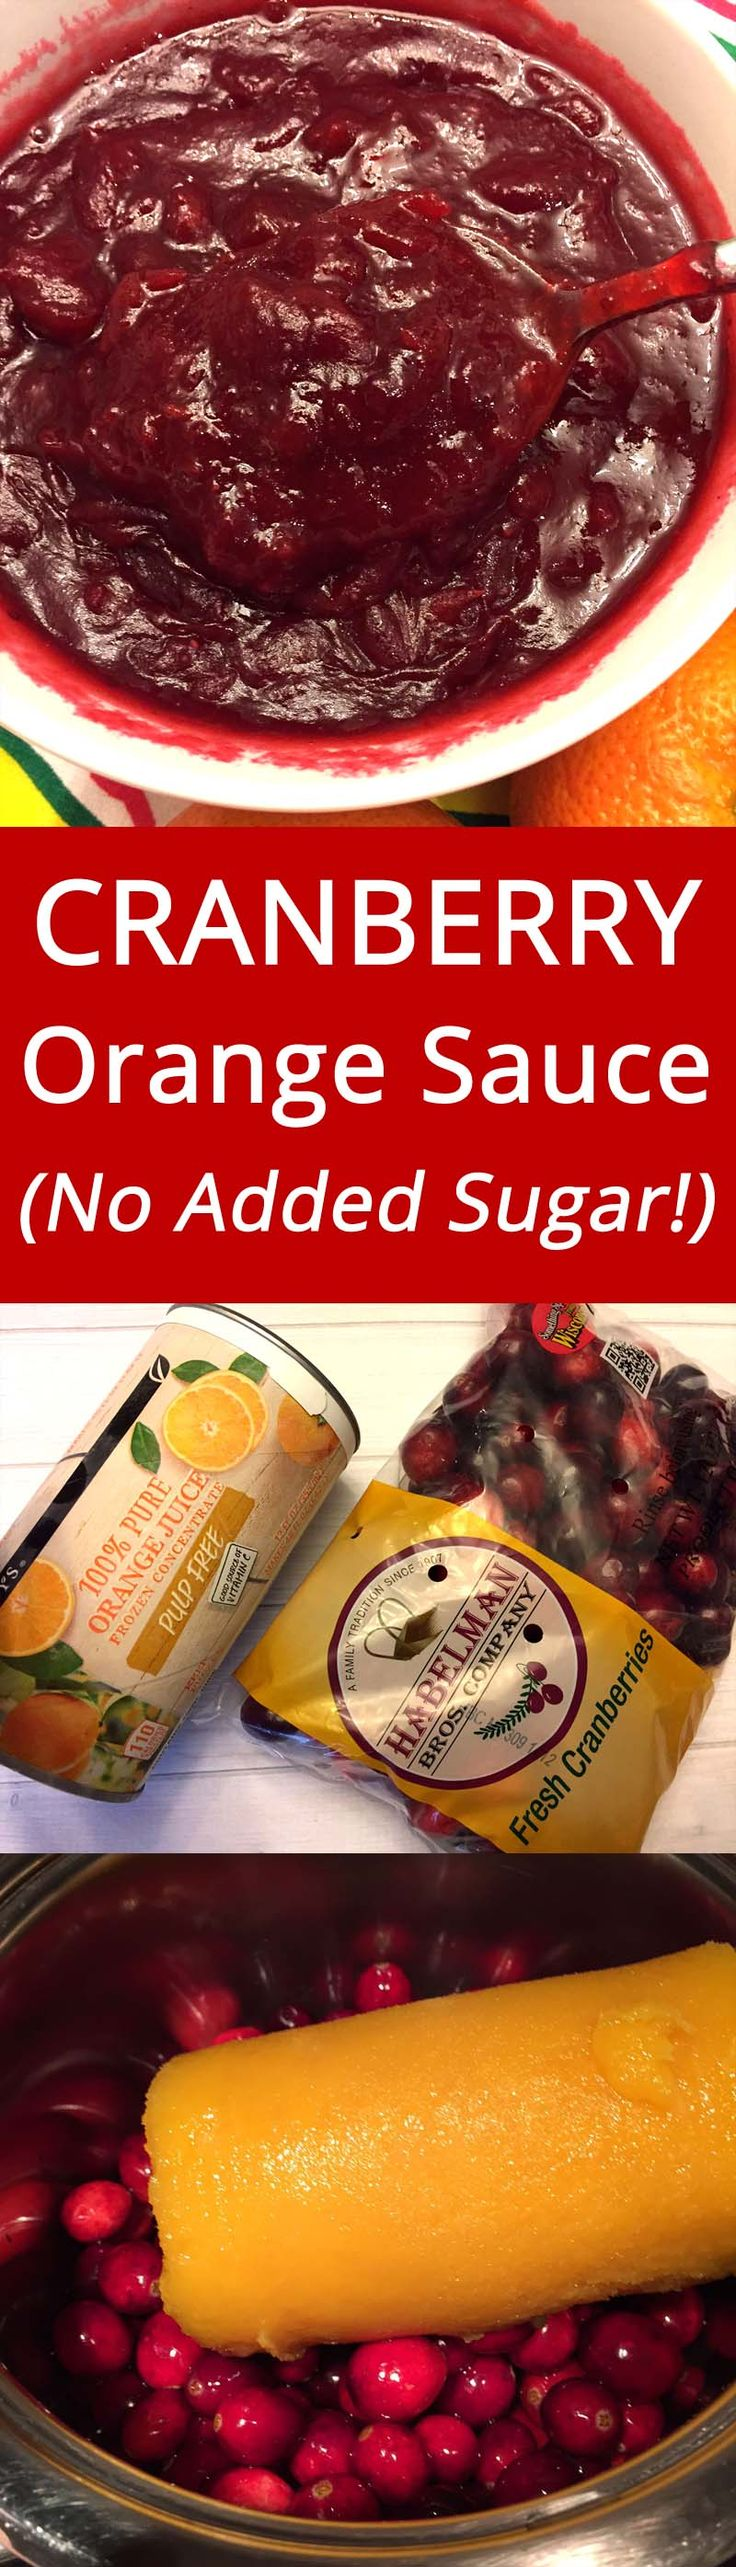 Healthy Cranberry Orange Sauce With NO ADDED SUGAR - this is genius!   MelanieCooks.com